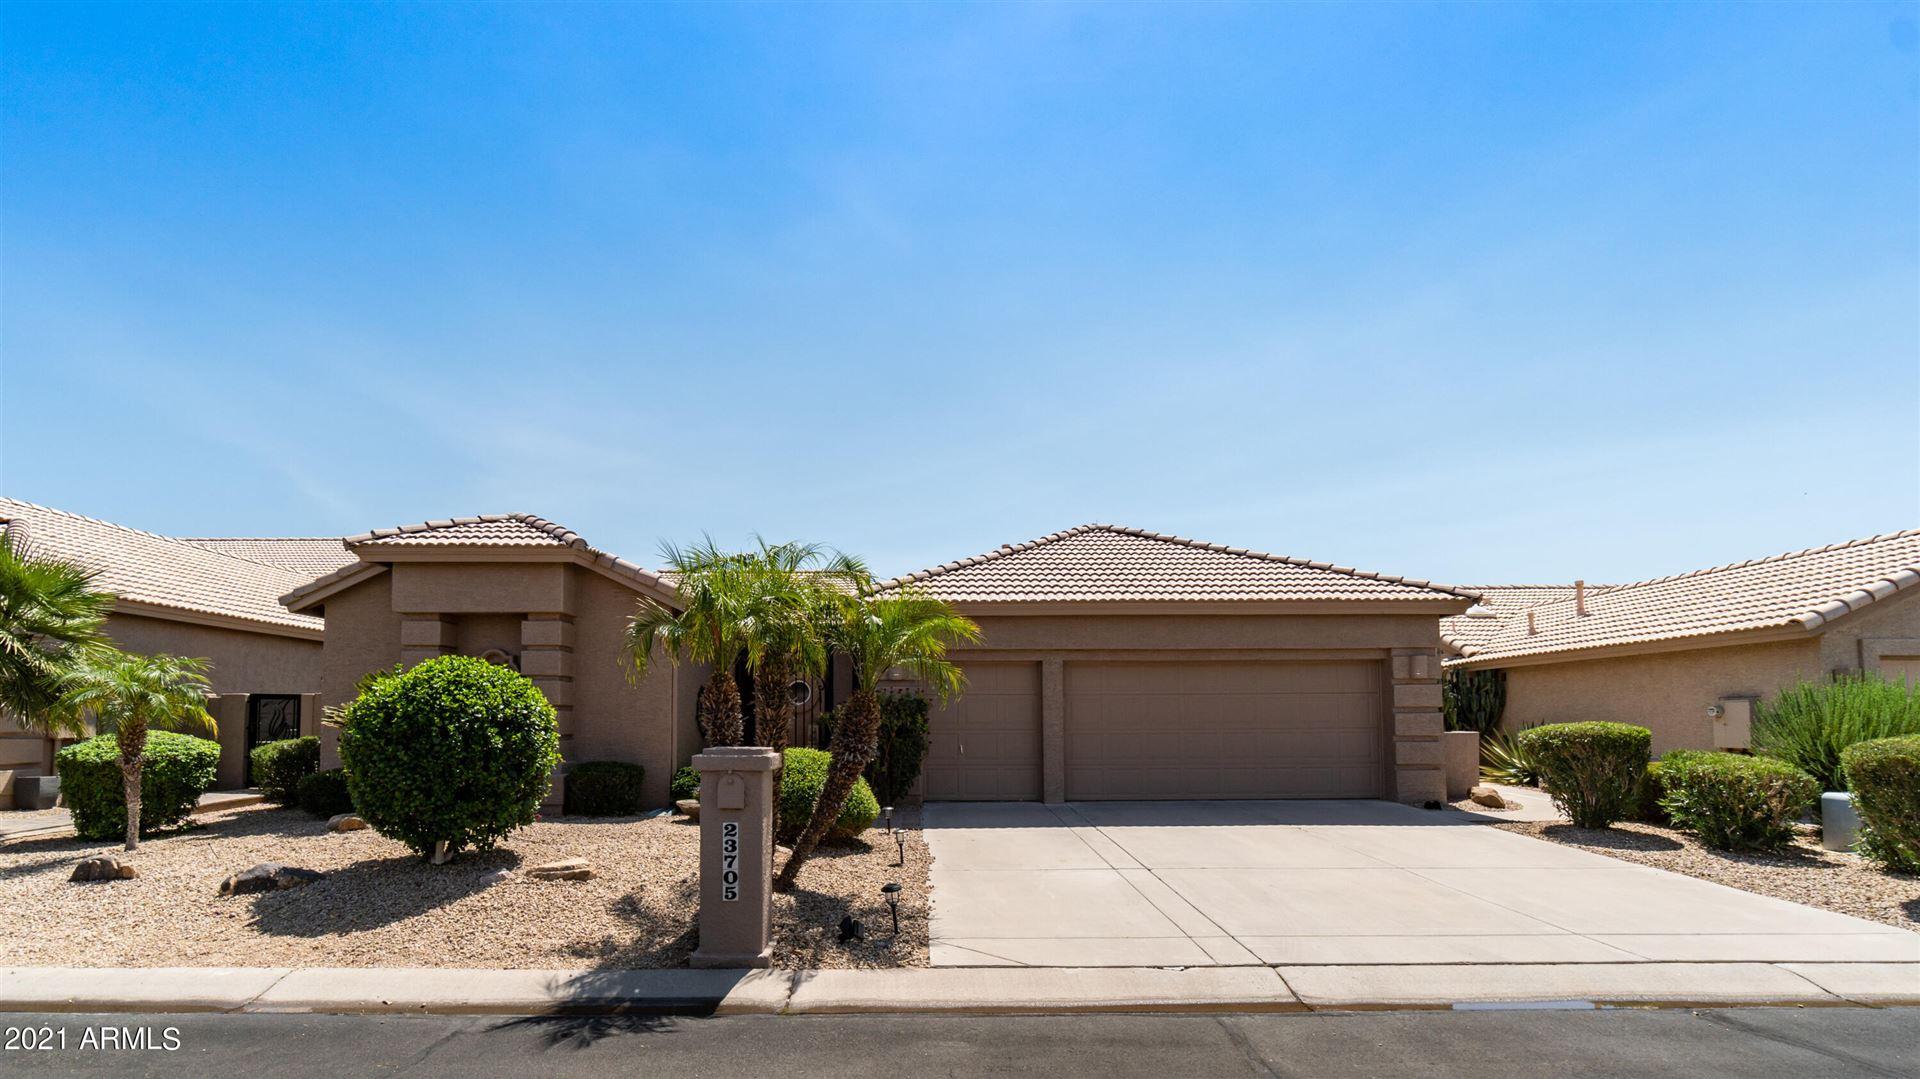 Photo of 23705 S DESERT SANDS Drive, Sun Lakes, AZ 85248 (MLS # 6262508)